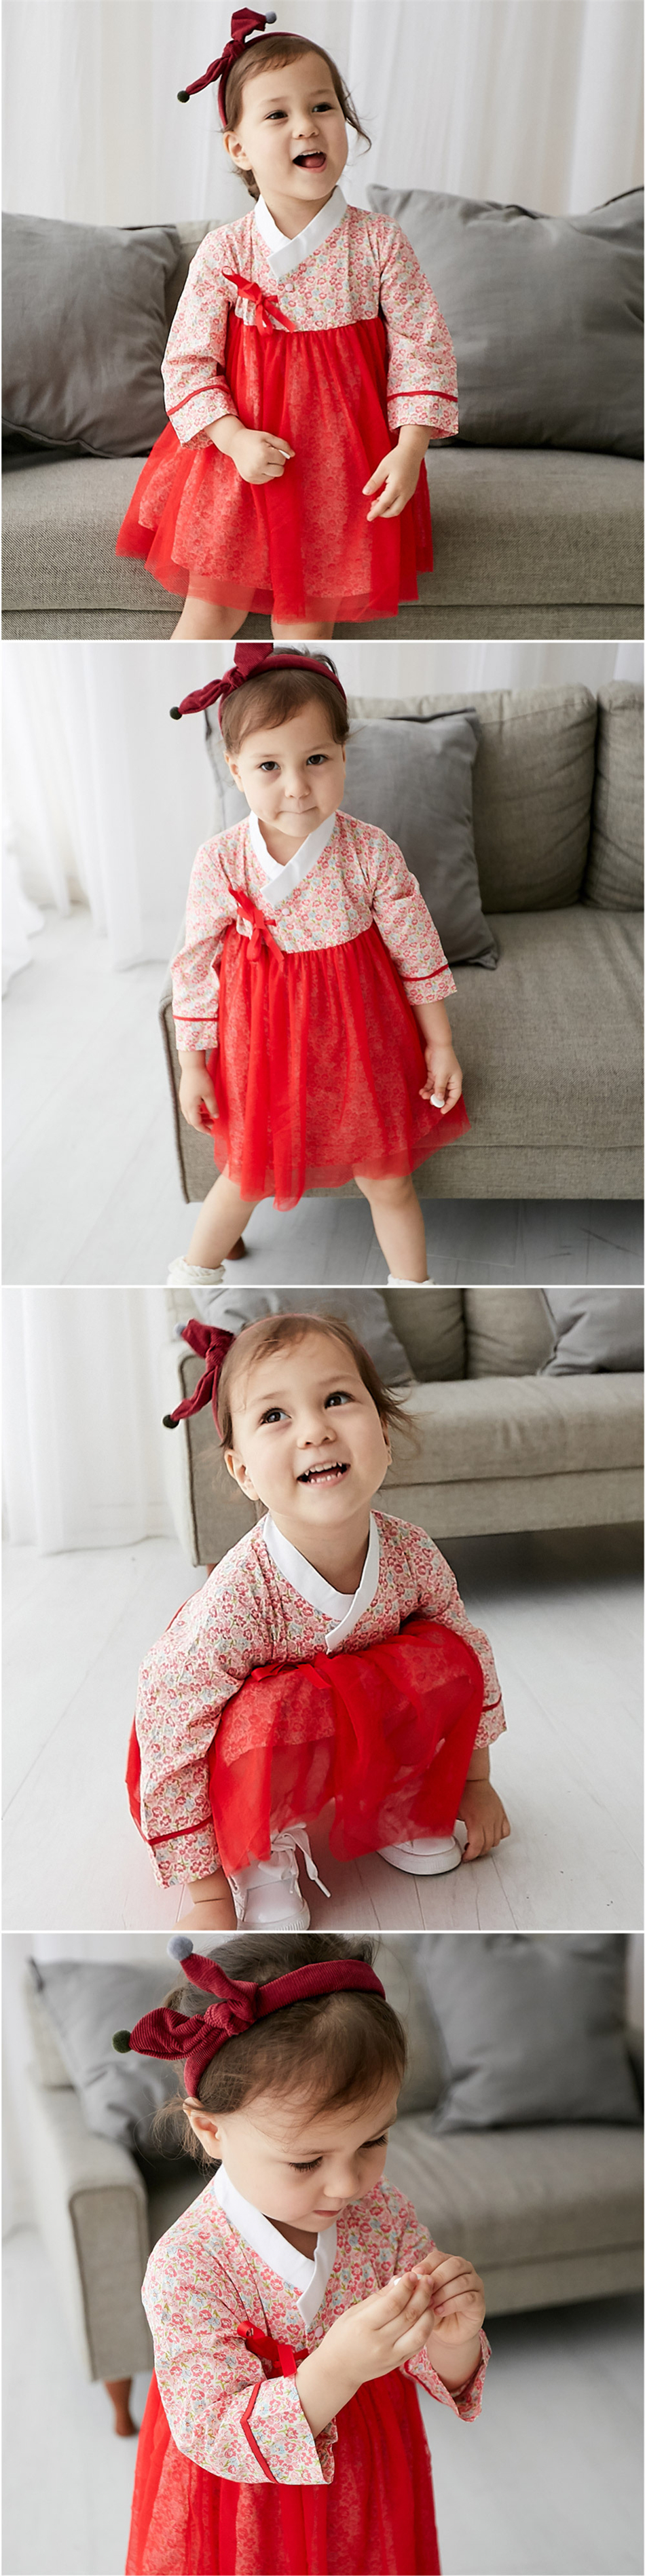 5d553ddb8 2019 0 1 Yeard Old Traditional Baby Girls Dress Korean Hanbok Korea ...